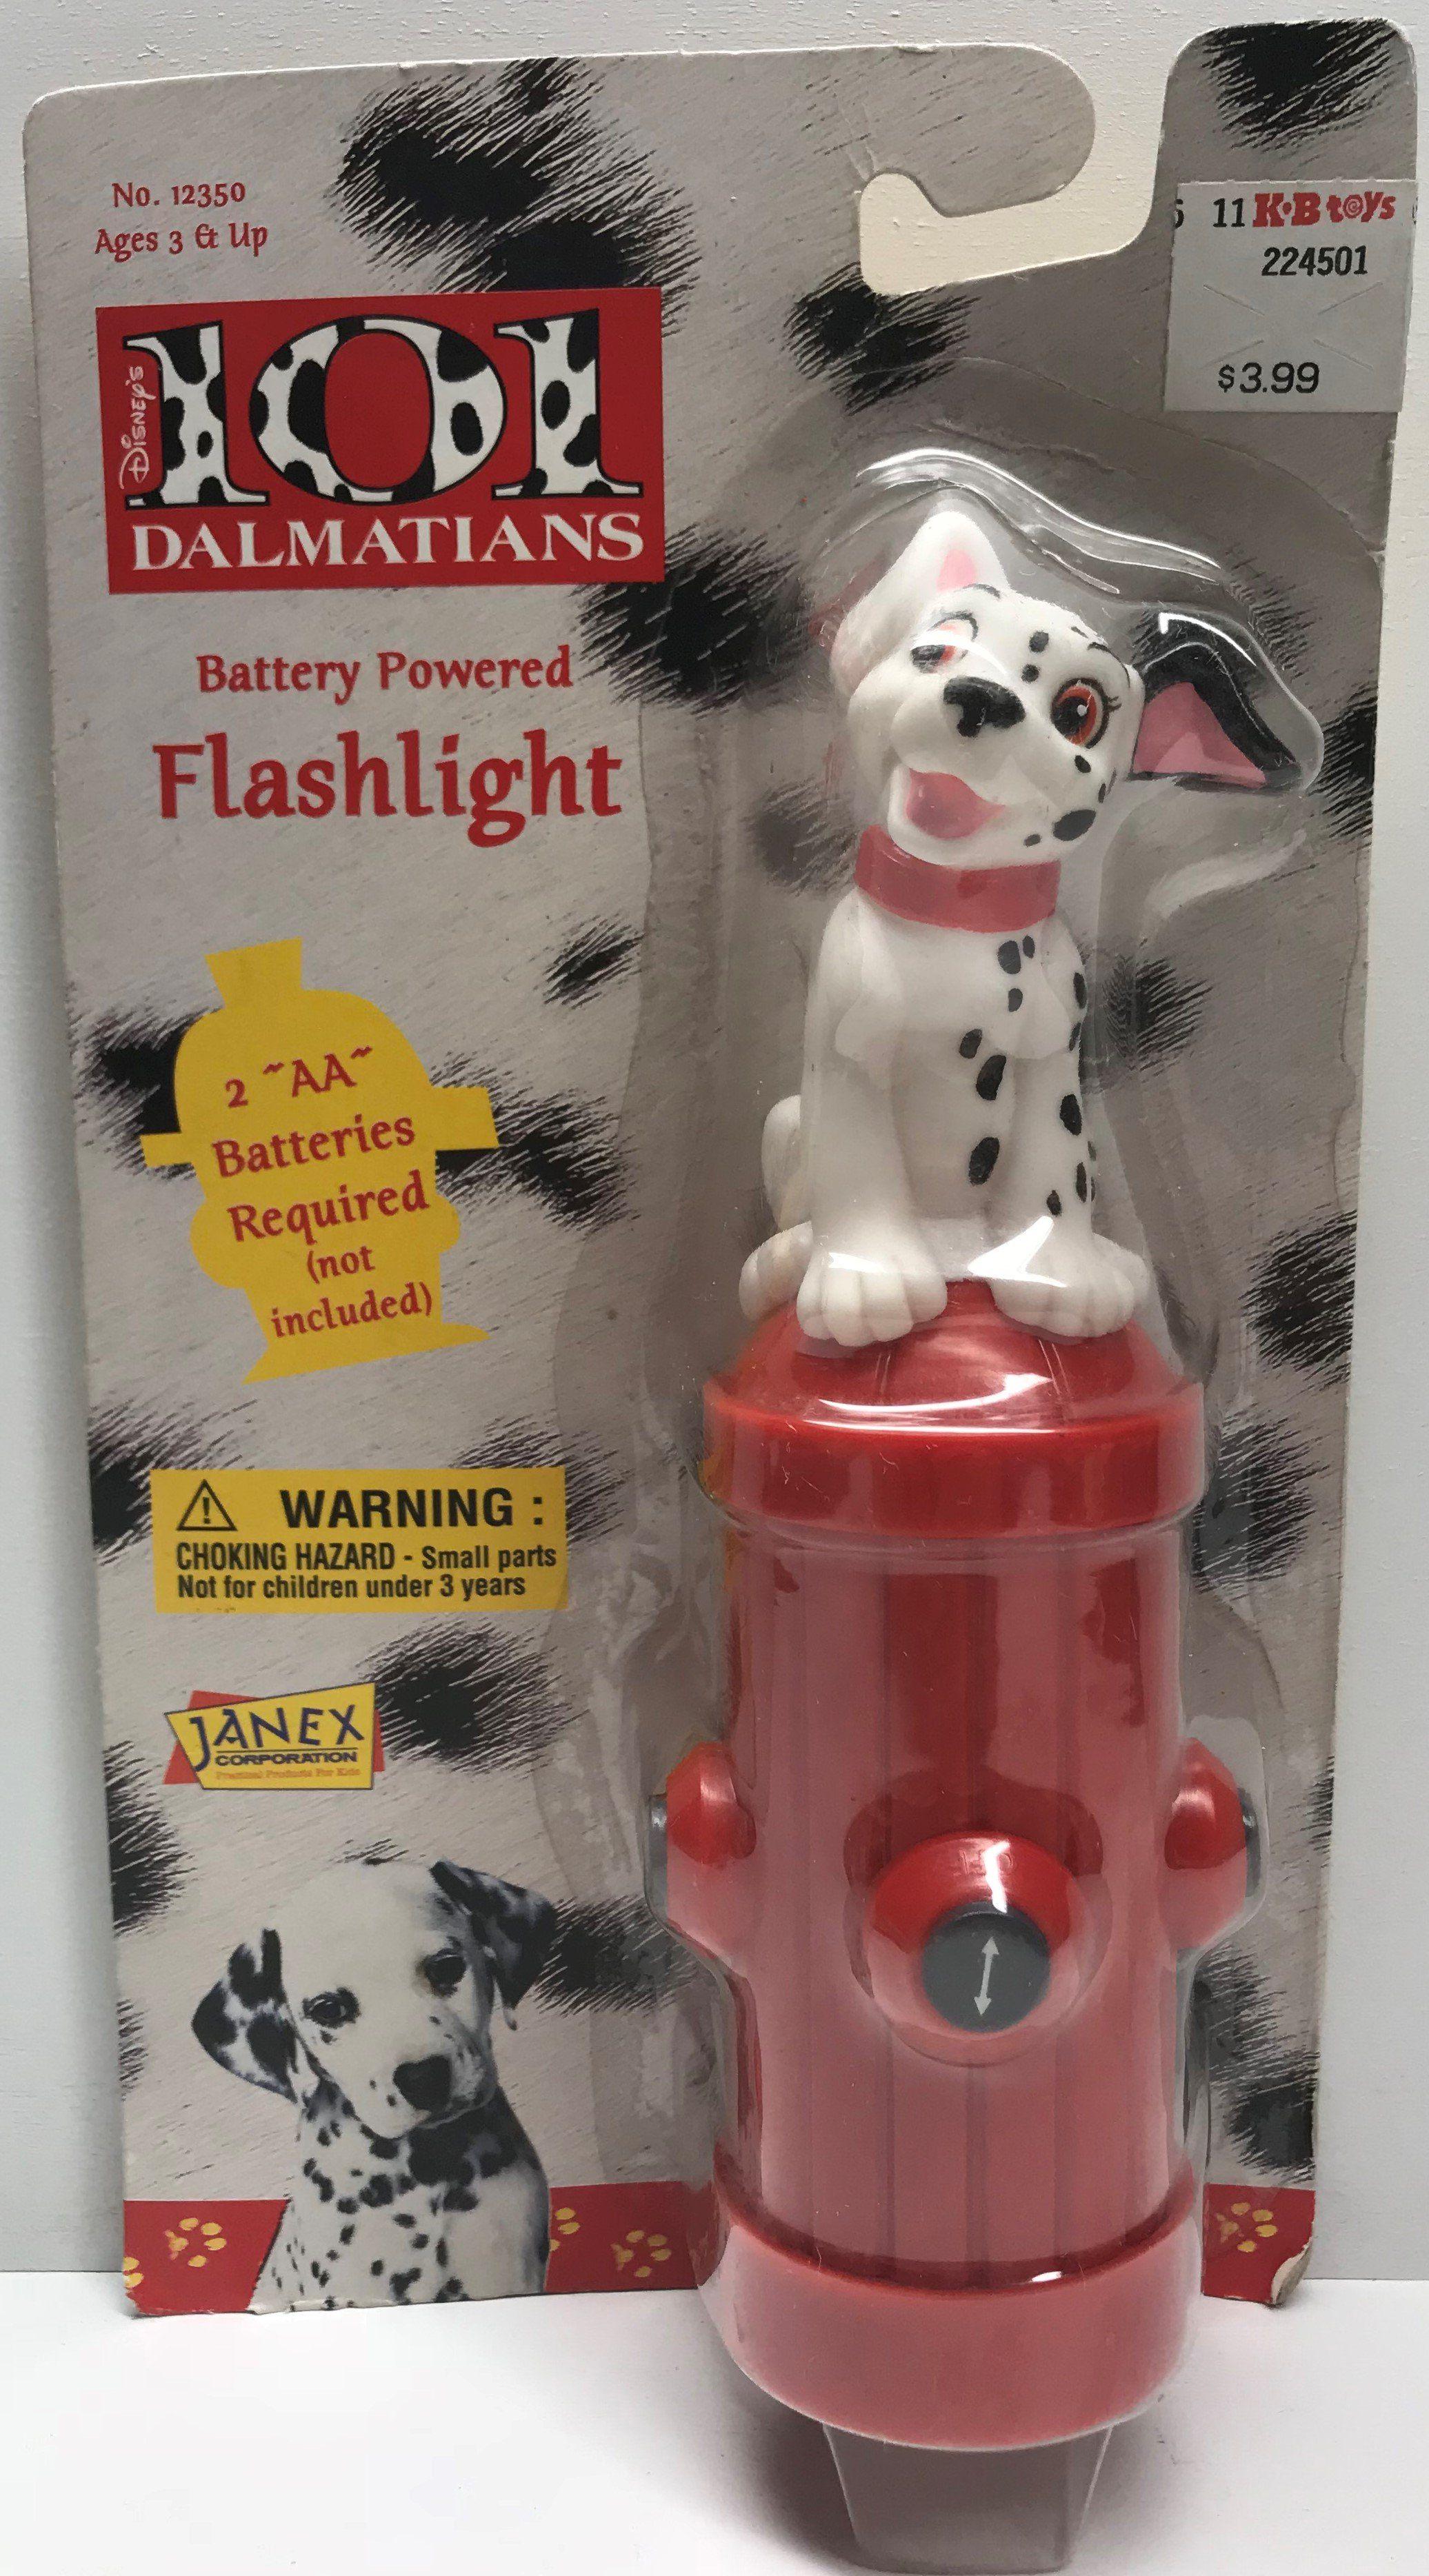 Tas038525 1996 Janex Disney S 101 Dalmatians Flashlight